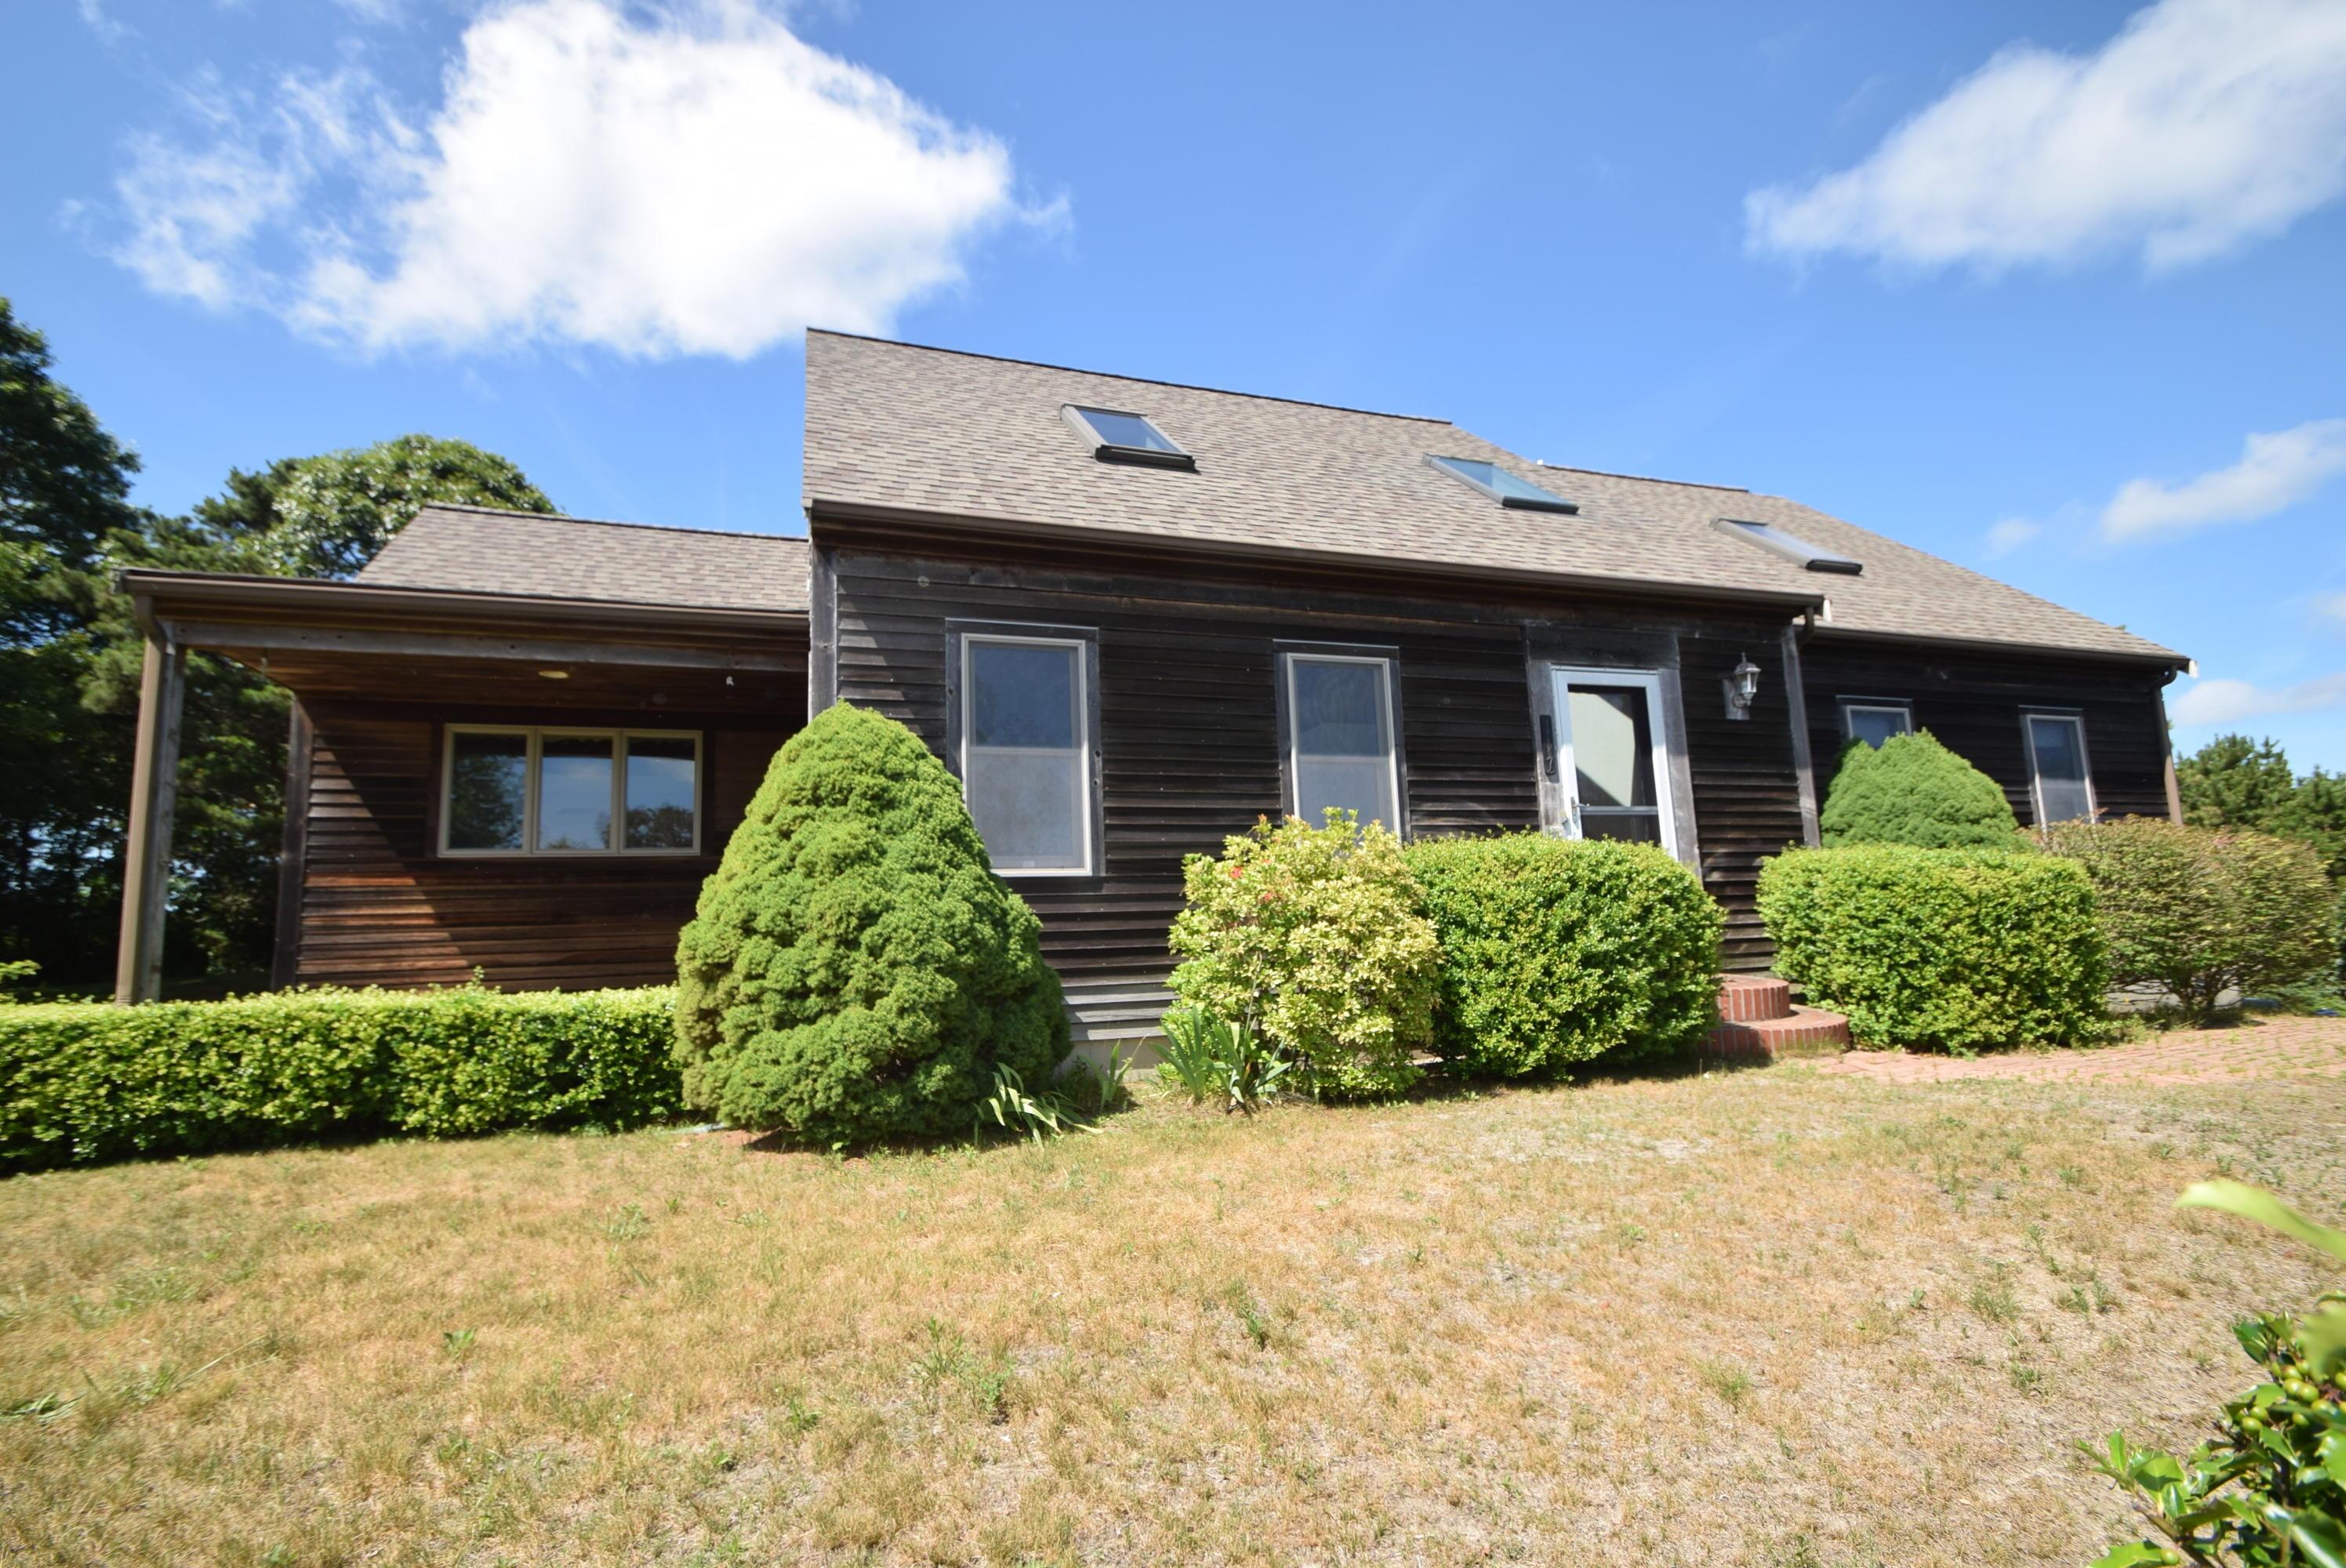 117 Griffiths Pond Road, Brewster MA, 02631 sales details